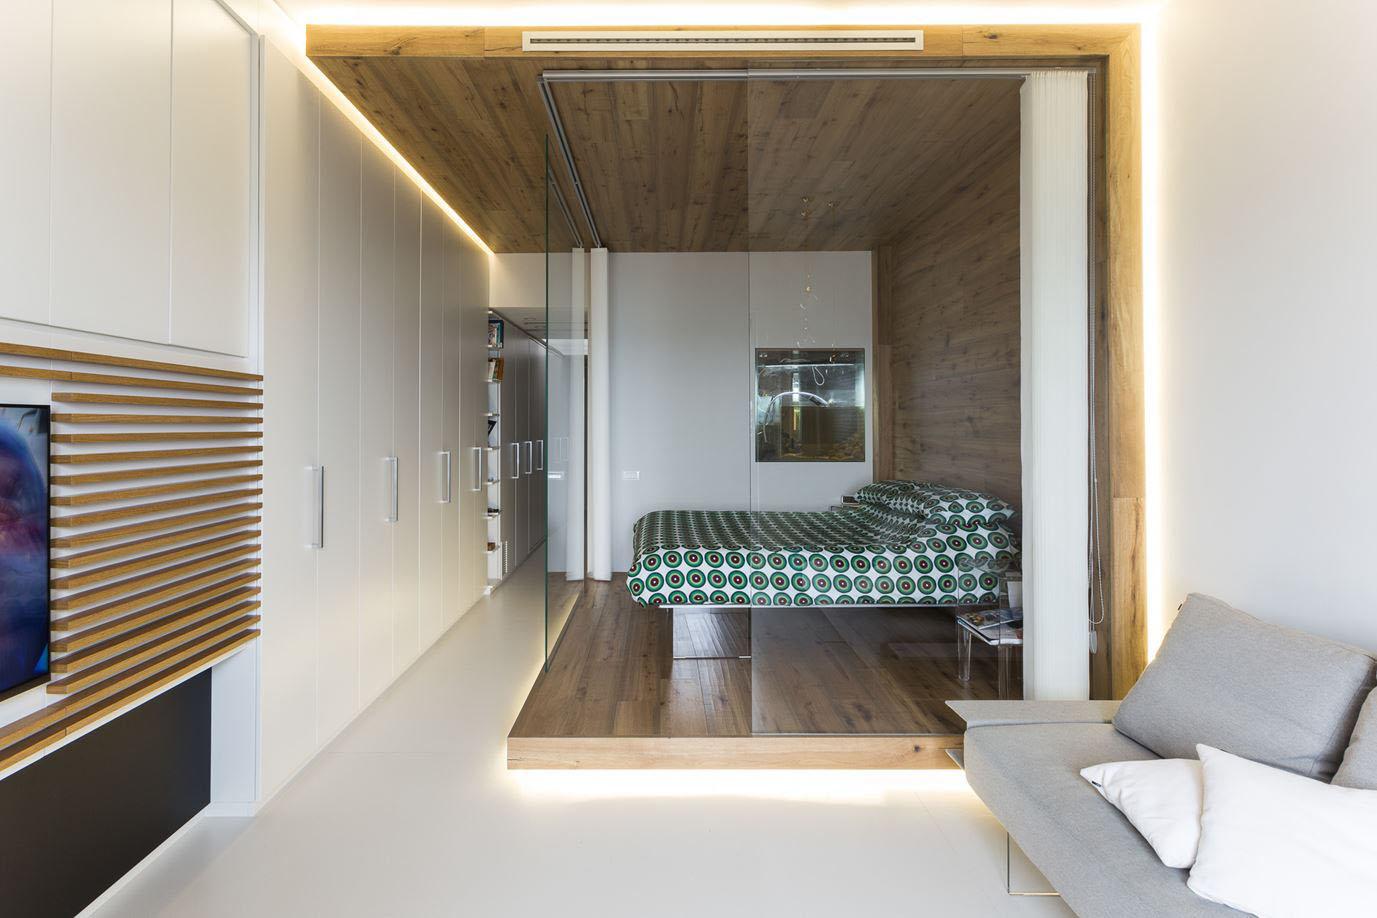 Идеи для однокомнатной квартиры хай тек